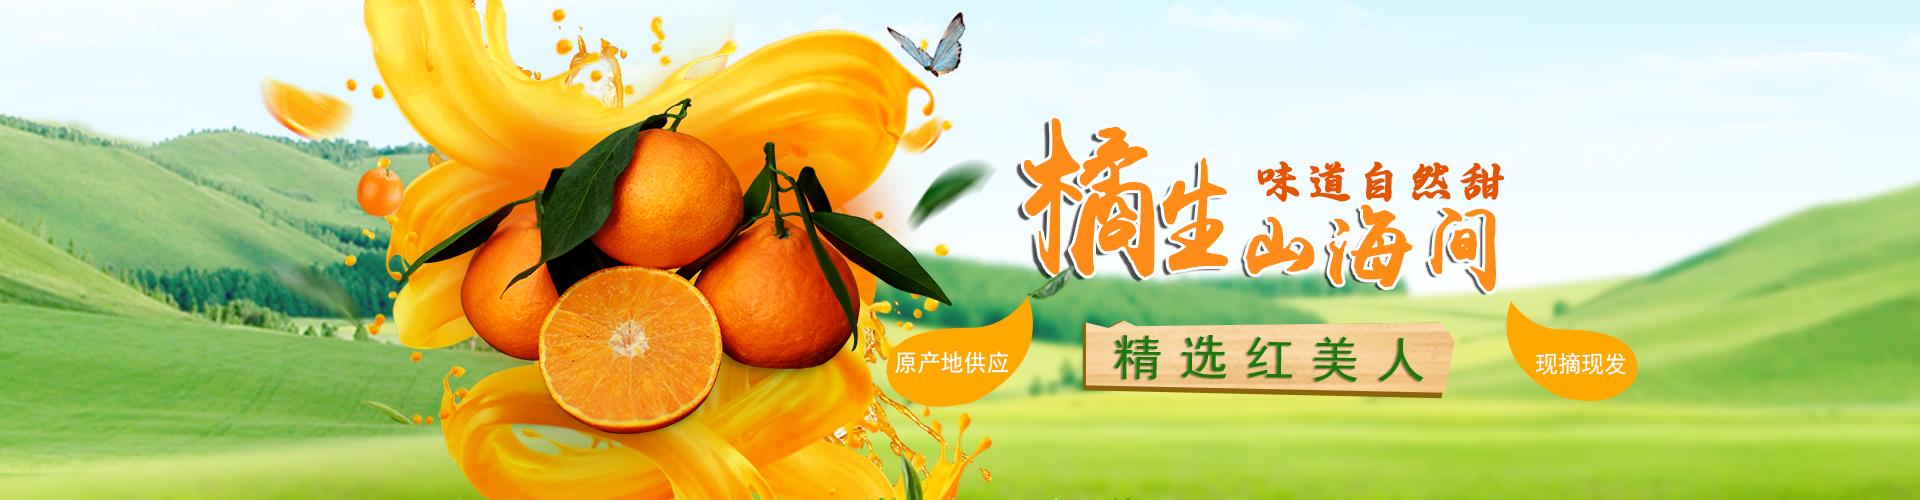 http://www.xiangshanhongmeiren.com/data/upload/202011/20201119155458_252.jpg